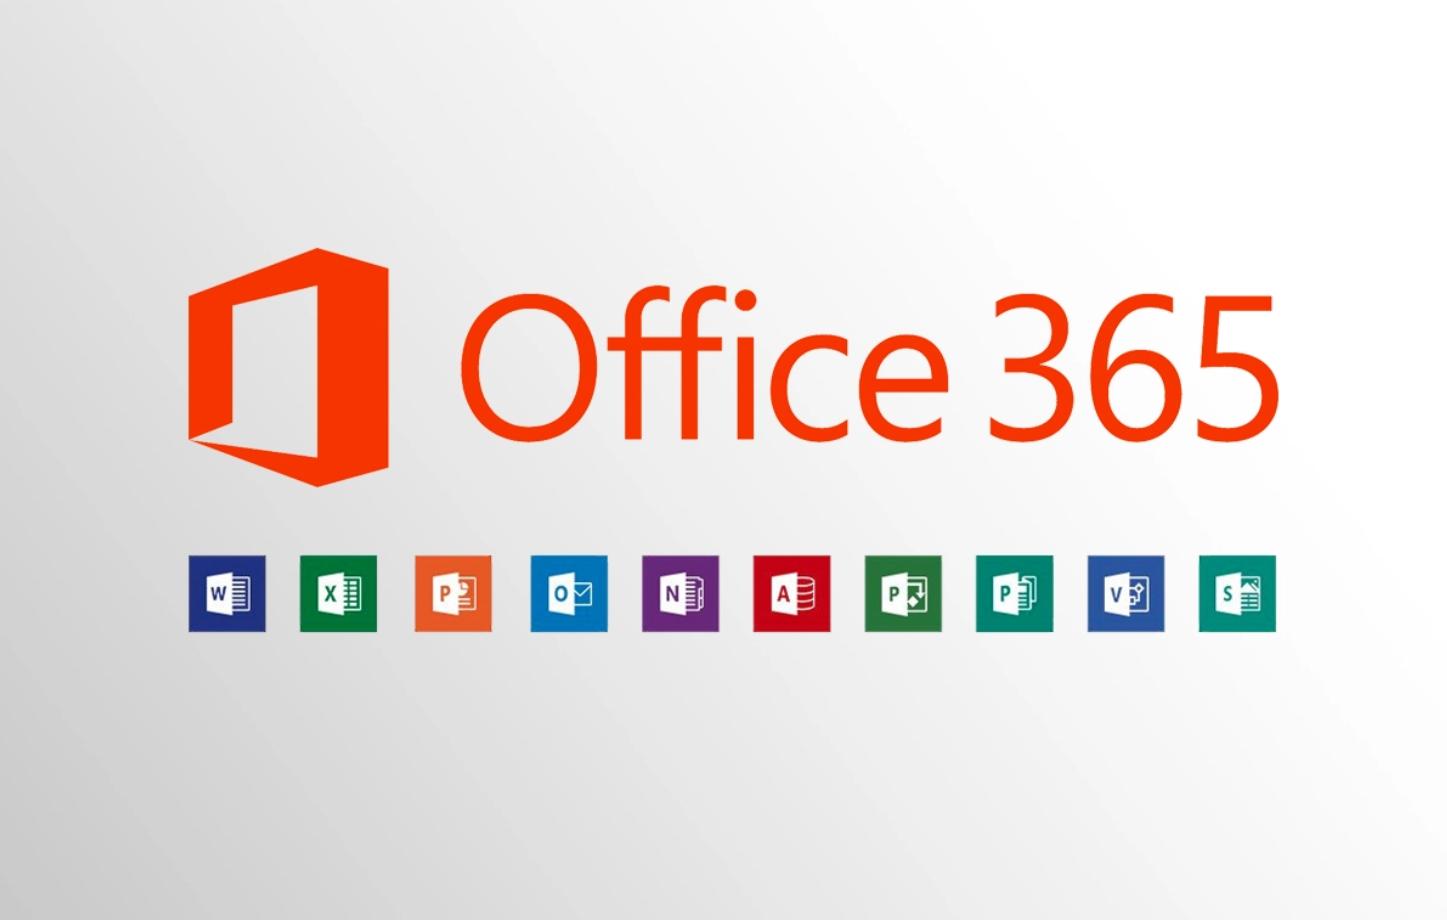 office 365 fiyat, izmir ofis 365